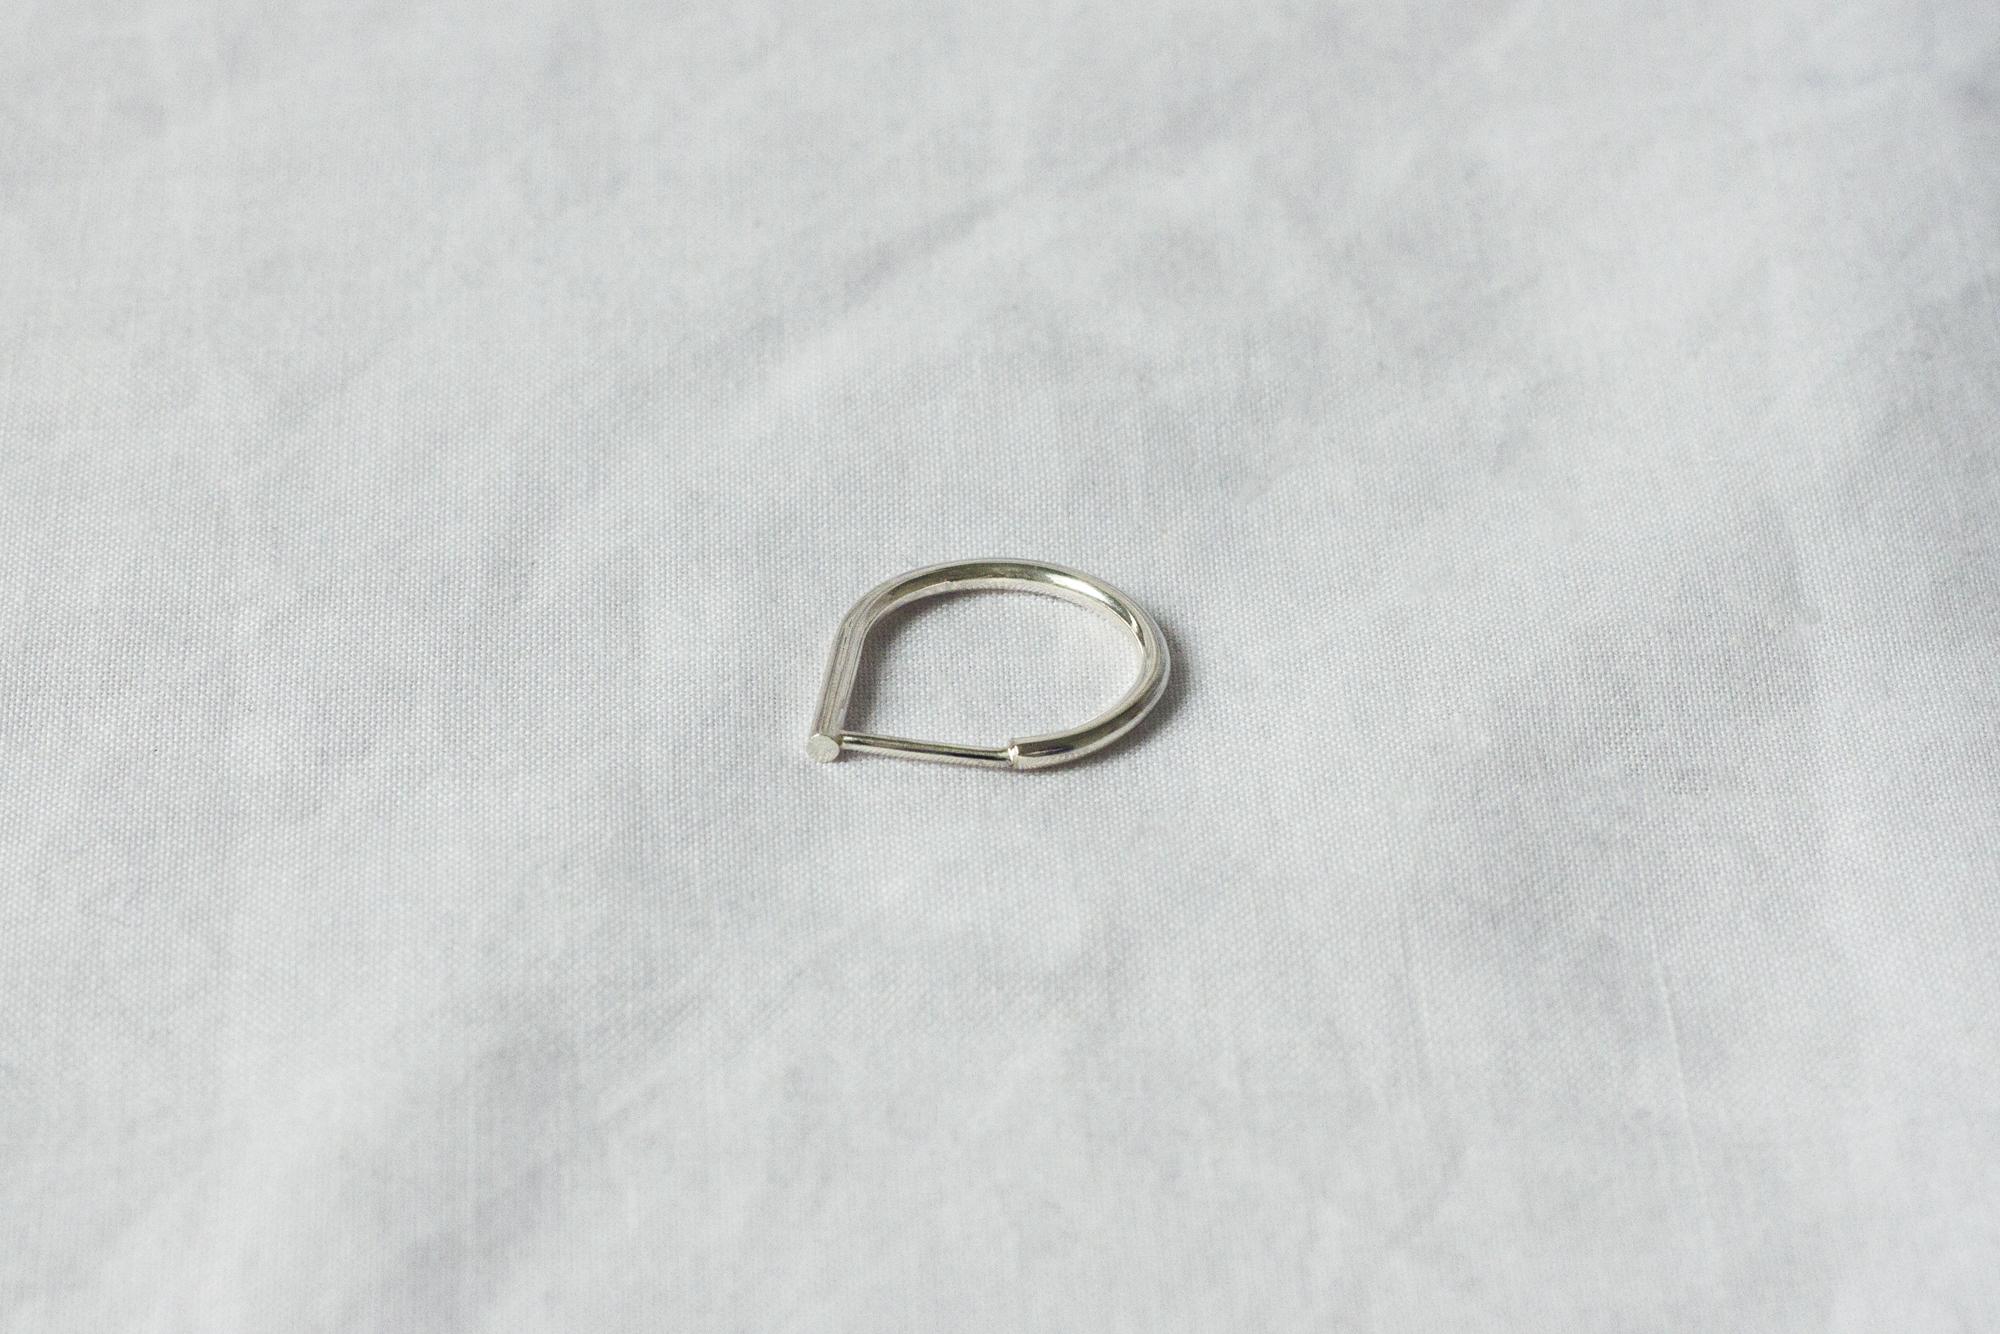 Nook ring